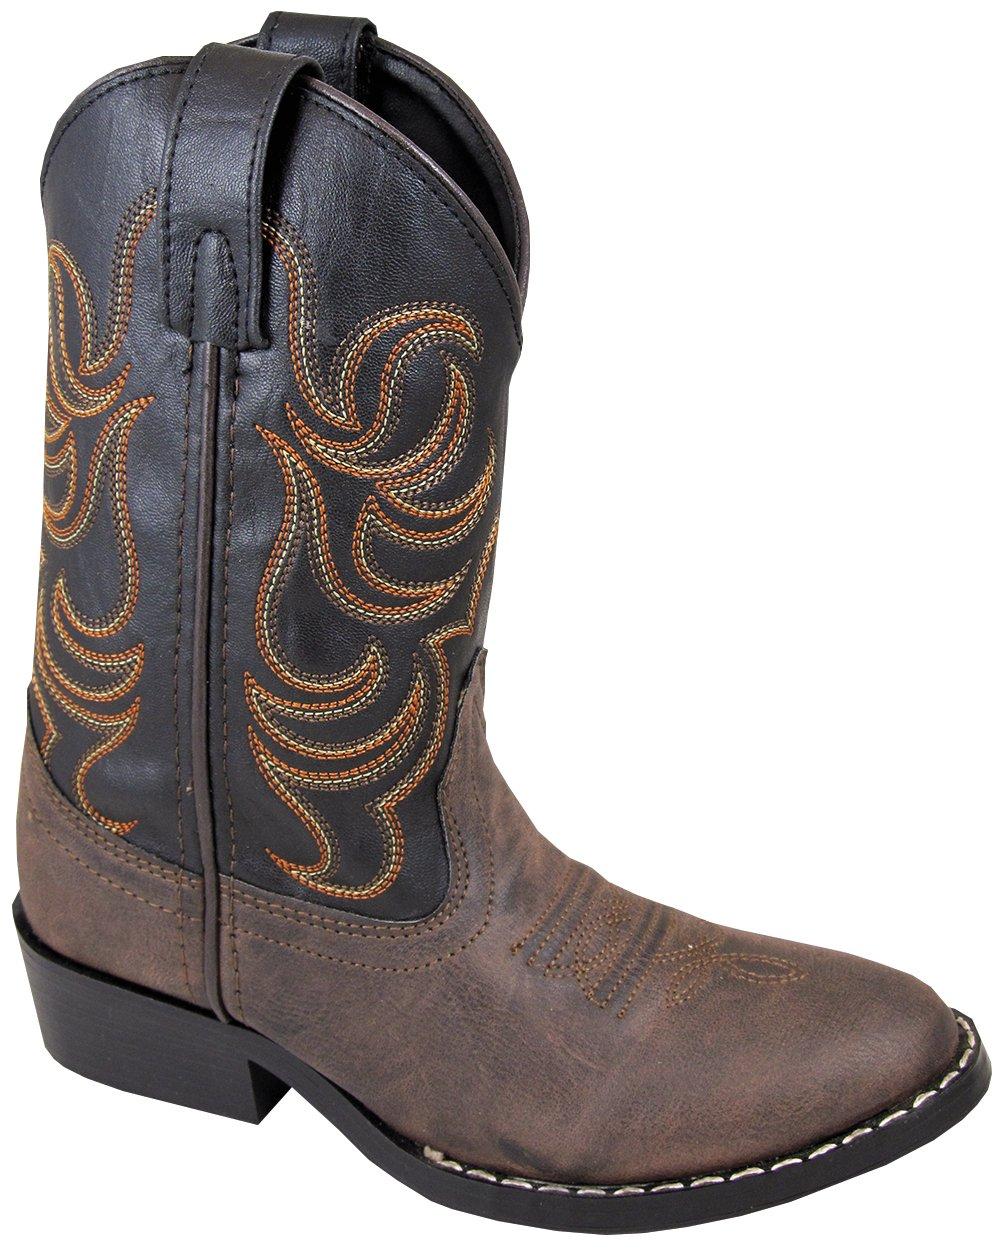 Smoky Child Boy Western Cowboy Boot, Brown, 12M